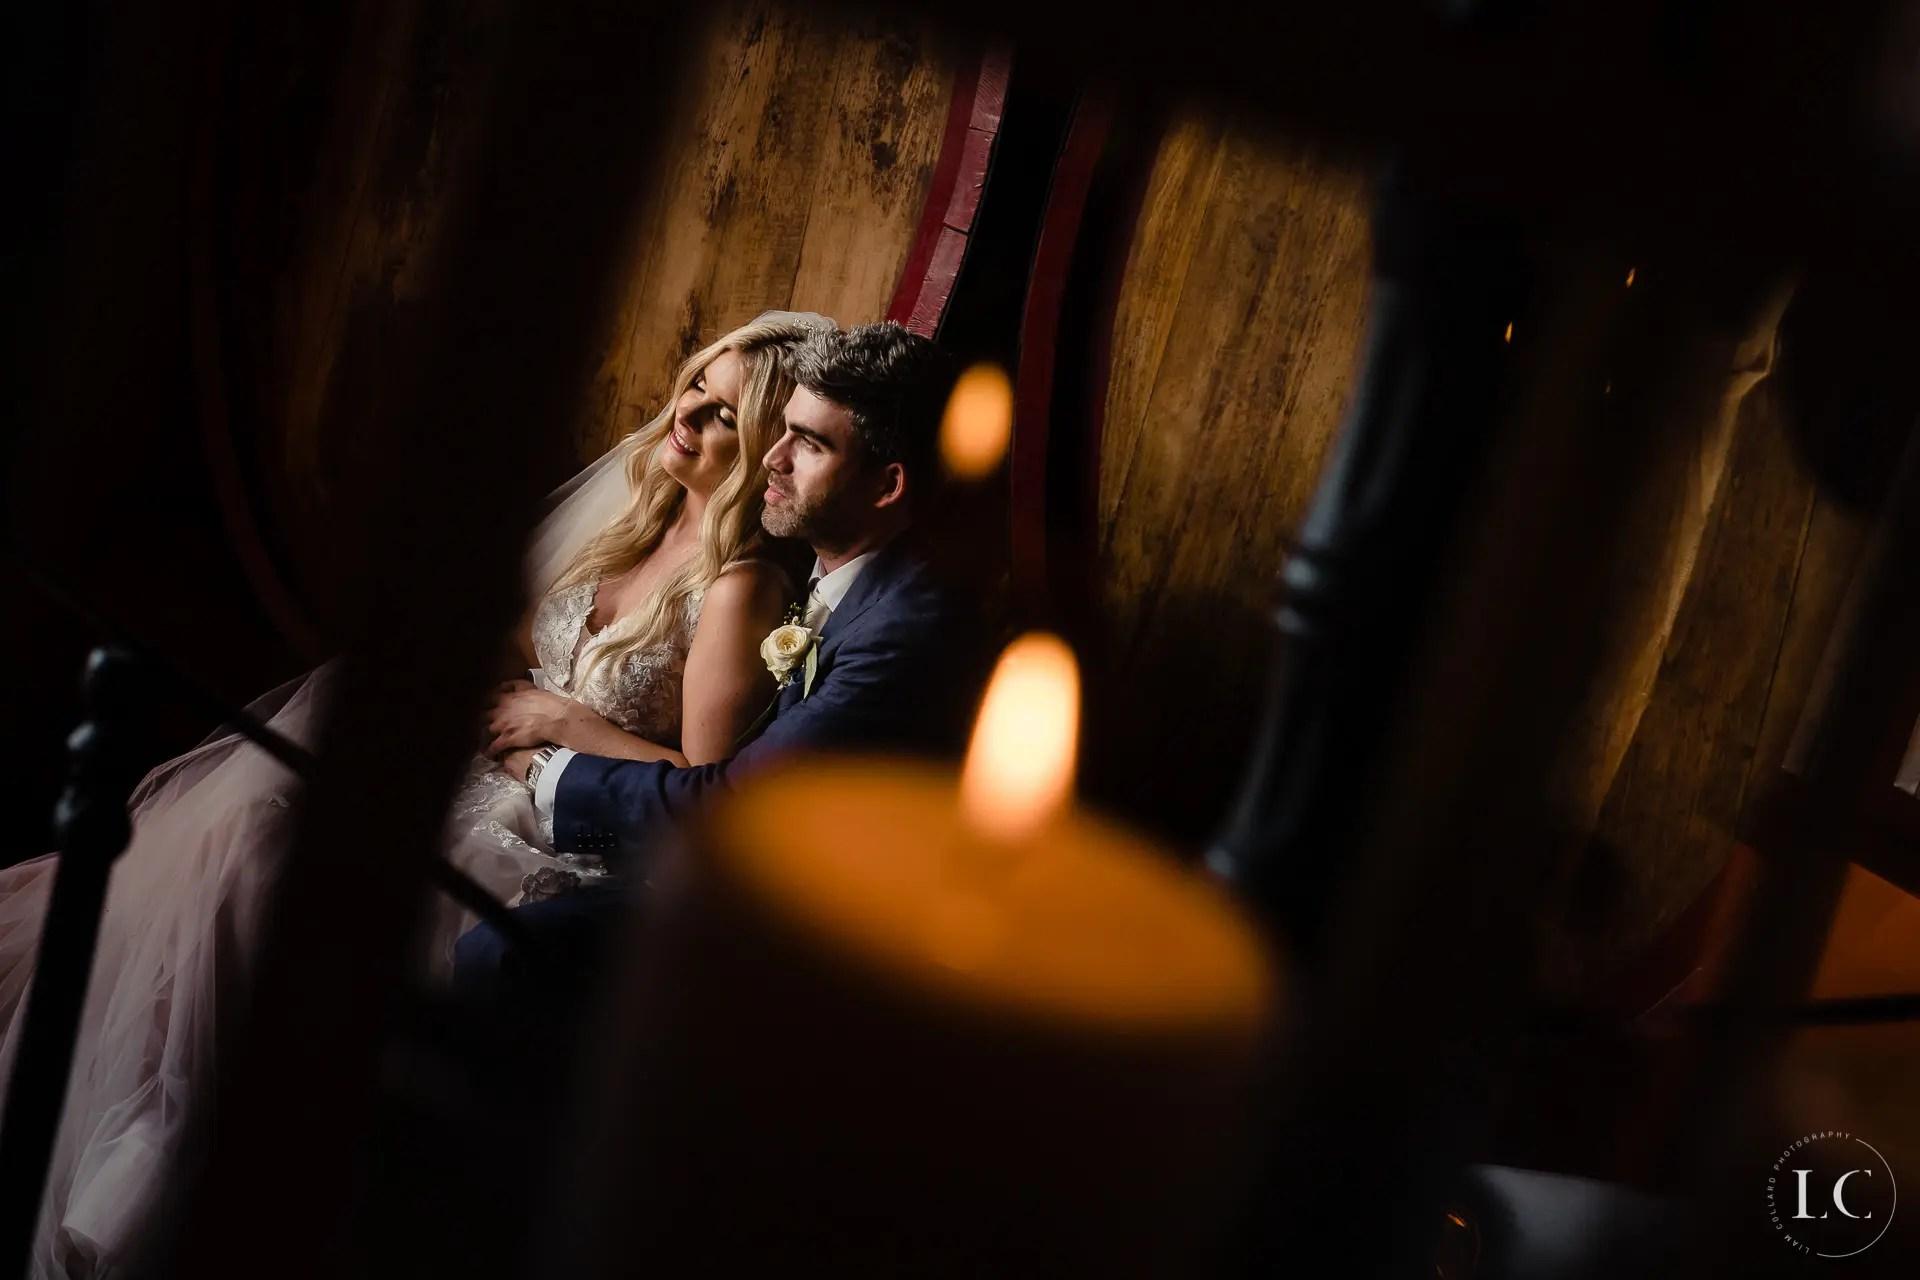 Newly weds embracing